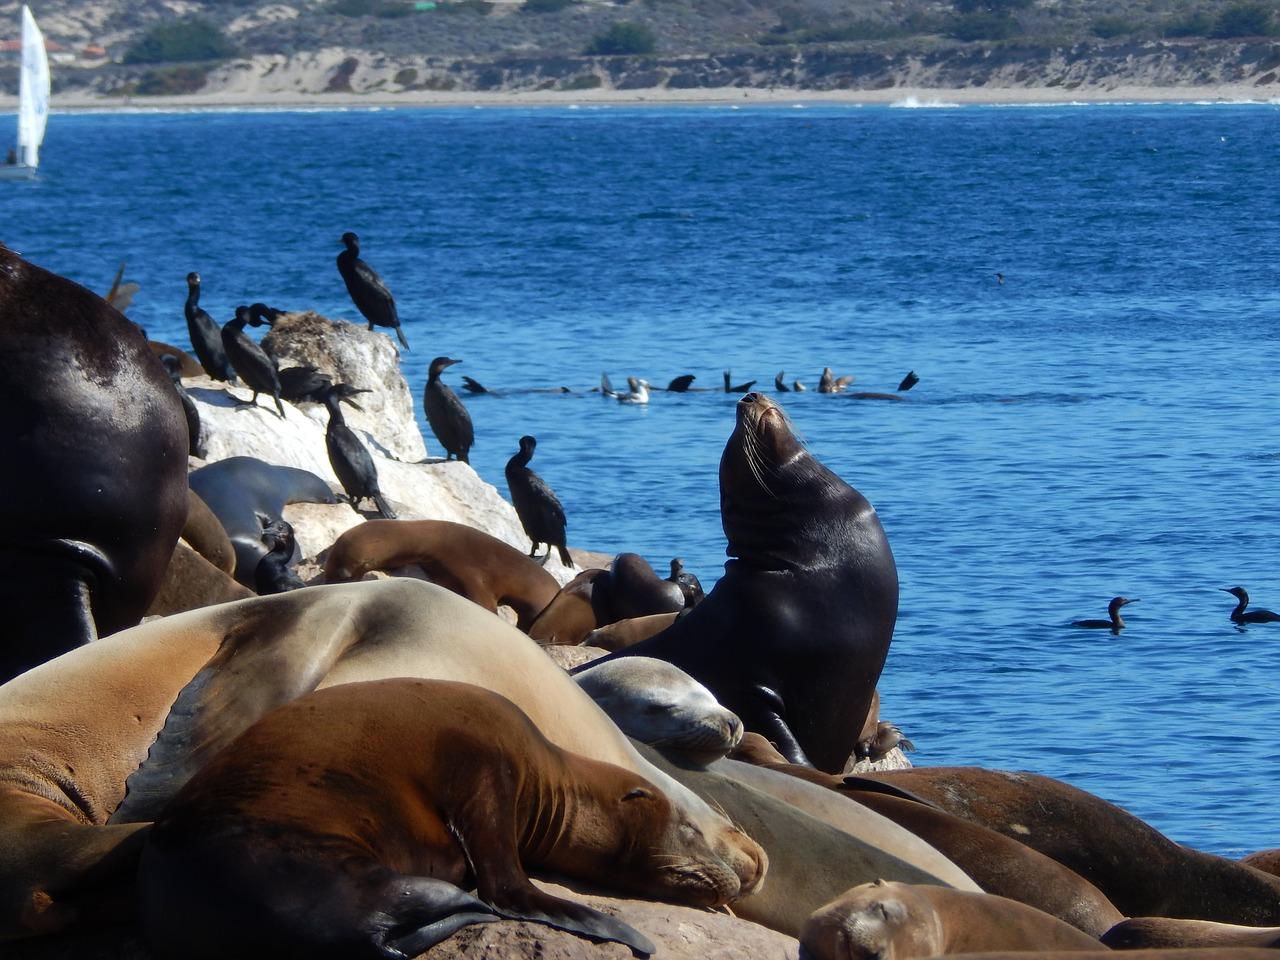 Sea Lions Monterey Bay - Pixabay - Public Domain